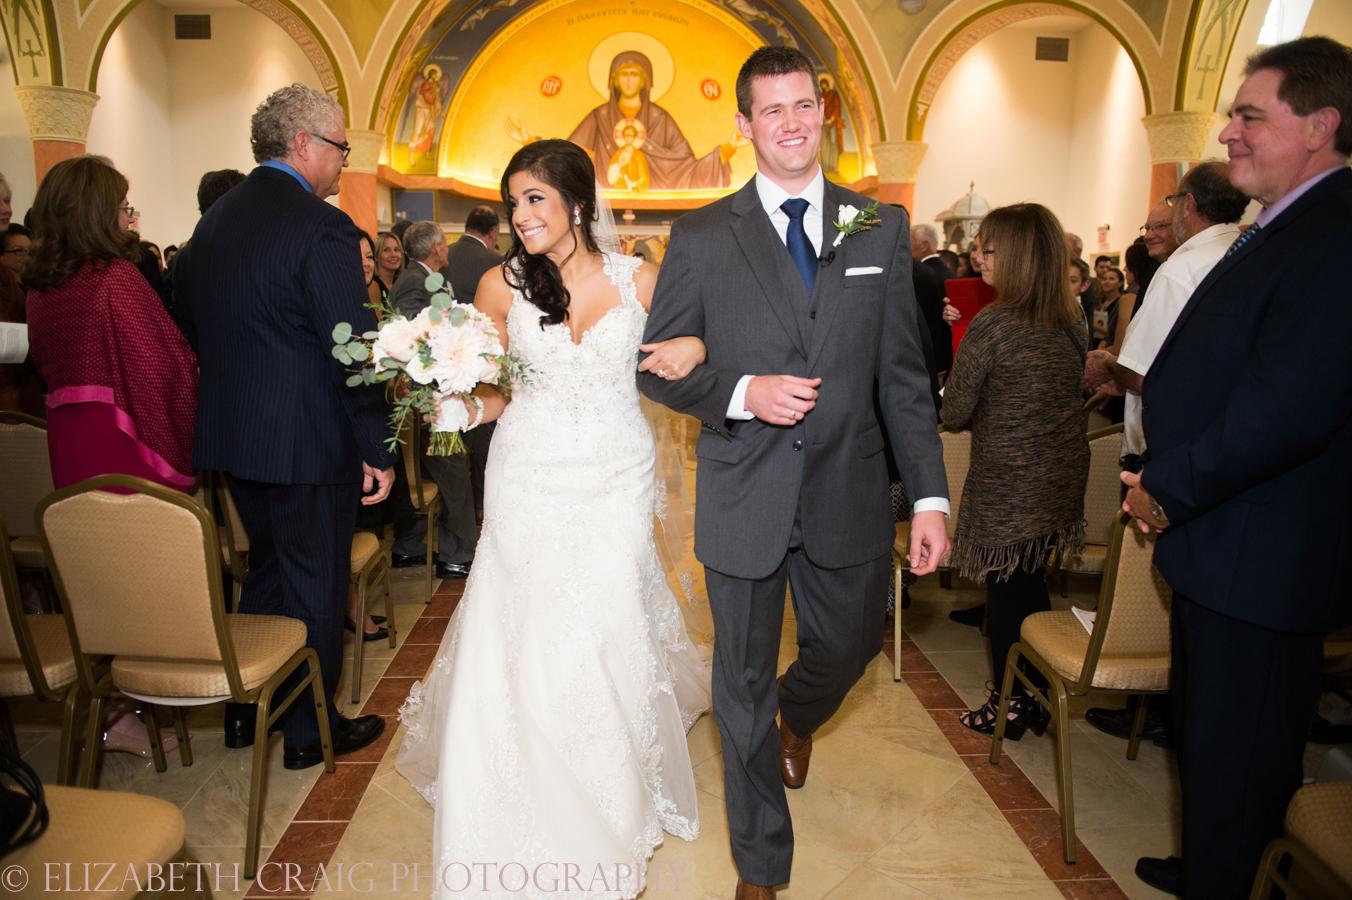 pittsburgh-greek-weddings-fairmont-weddings-receptions-elizabeth-craig-photohgraphy-011